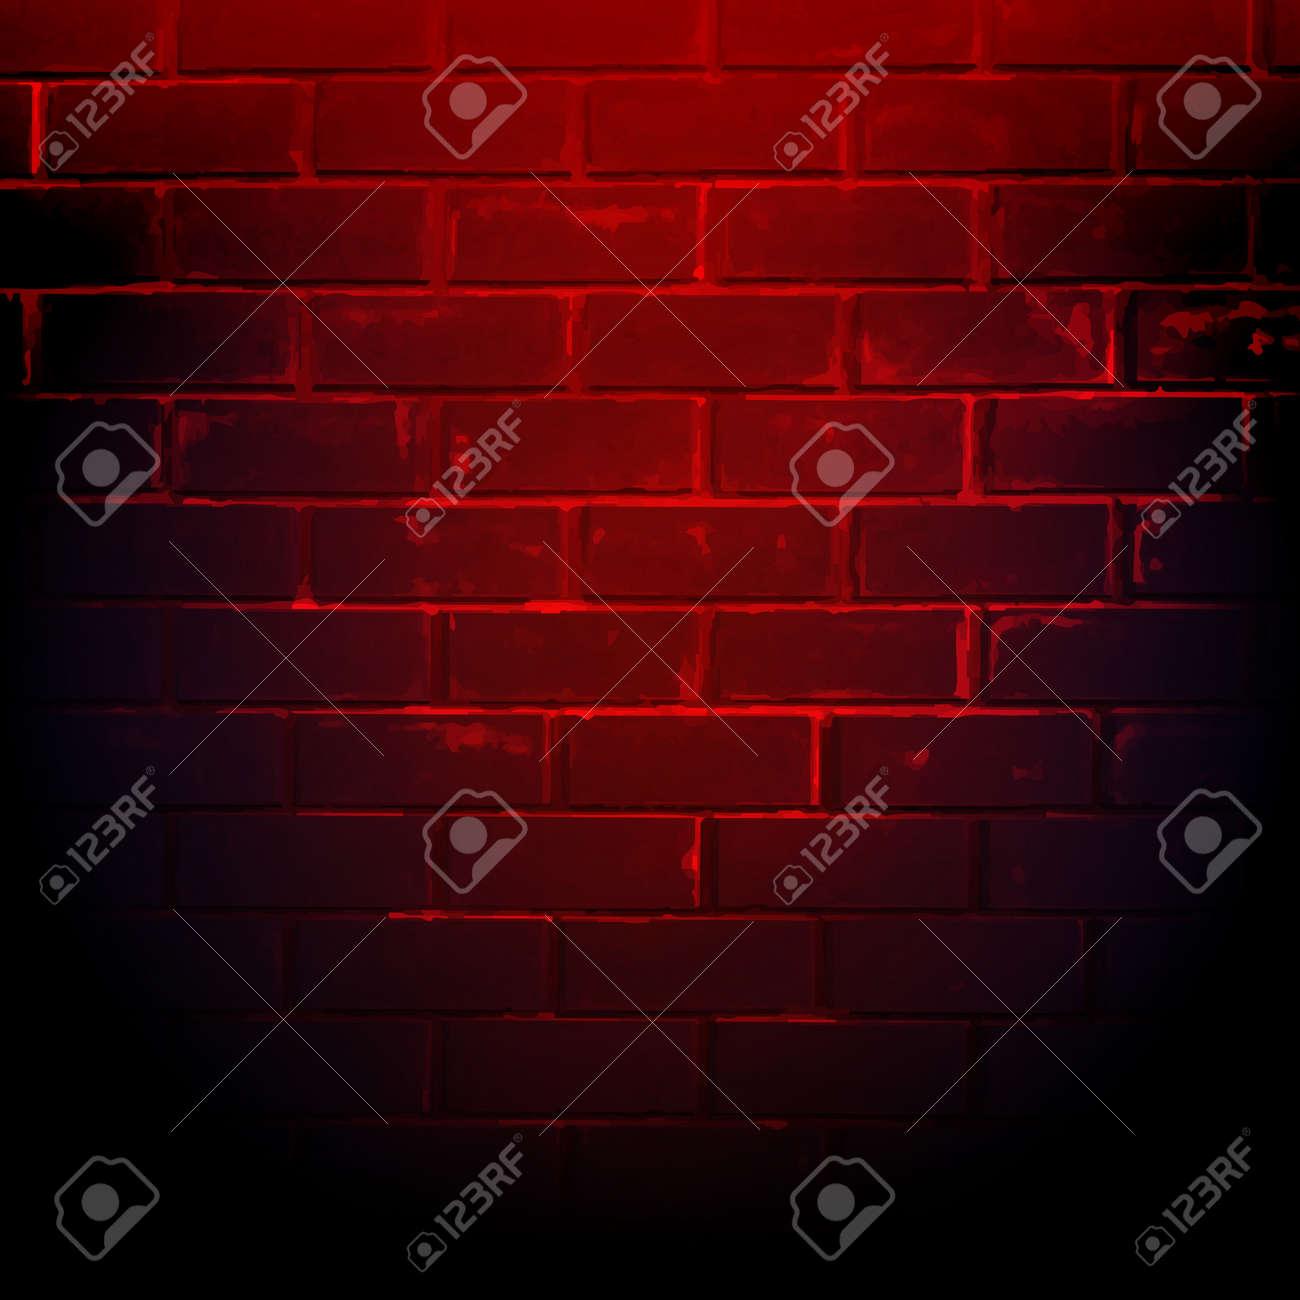 Dark Red Brick Wall With Gradient Mesh, Vector Illustration - 44688730